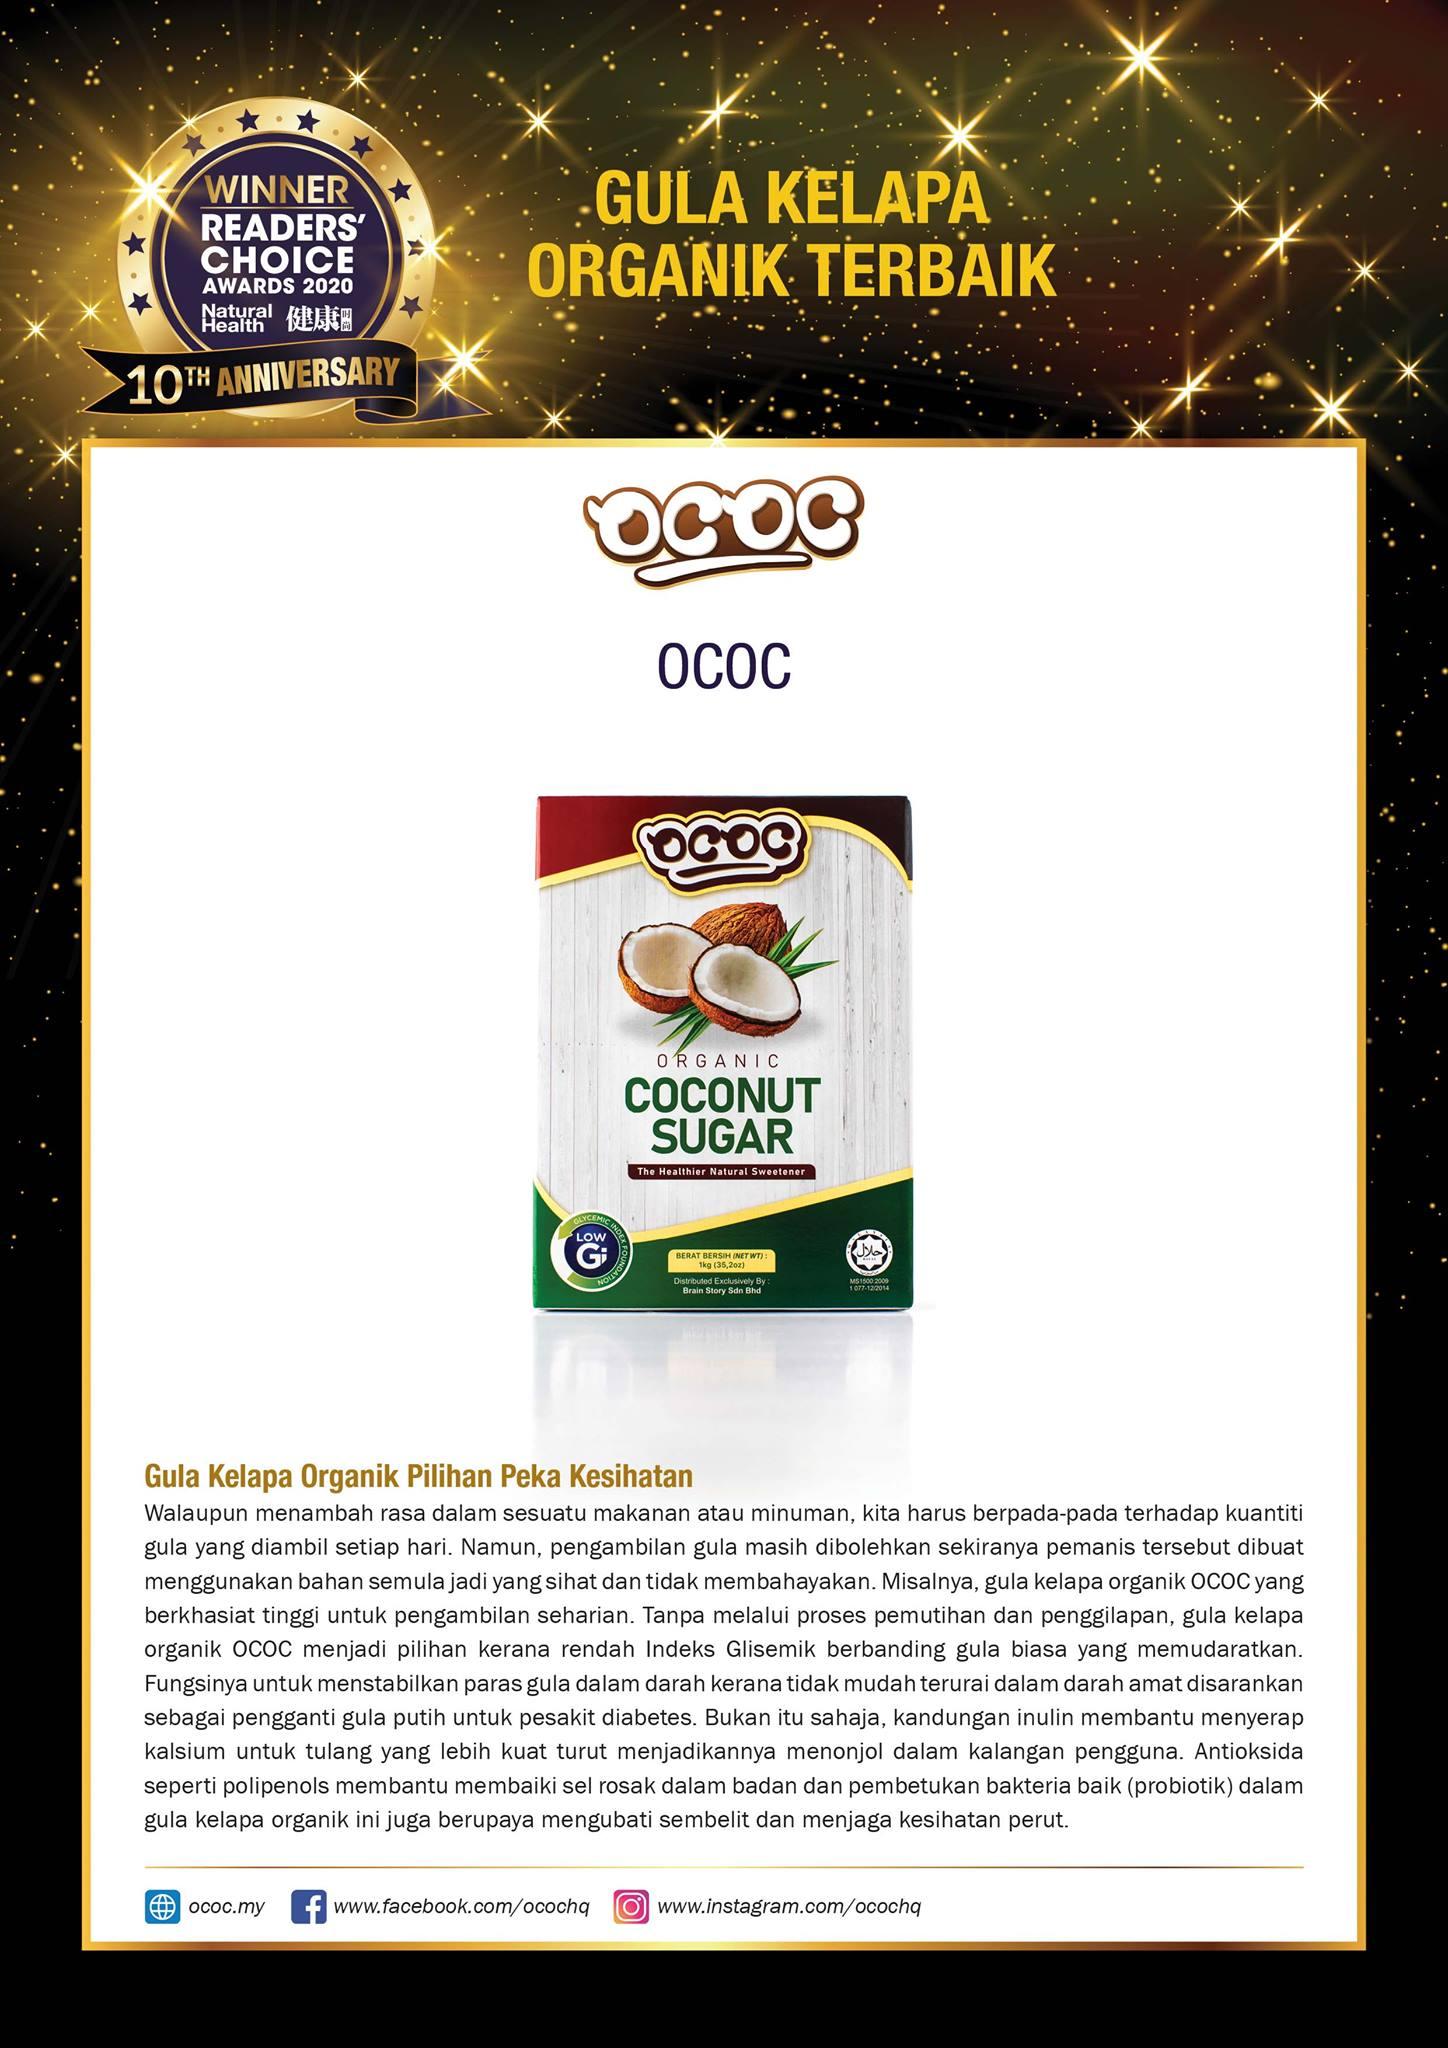 OCOC Organic Coconut Sugar